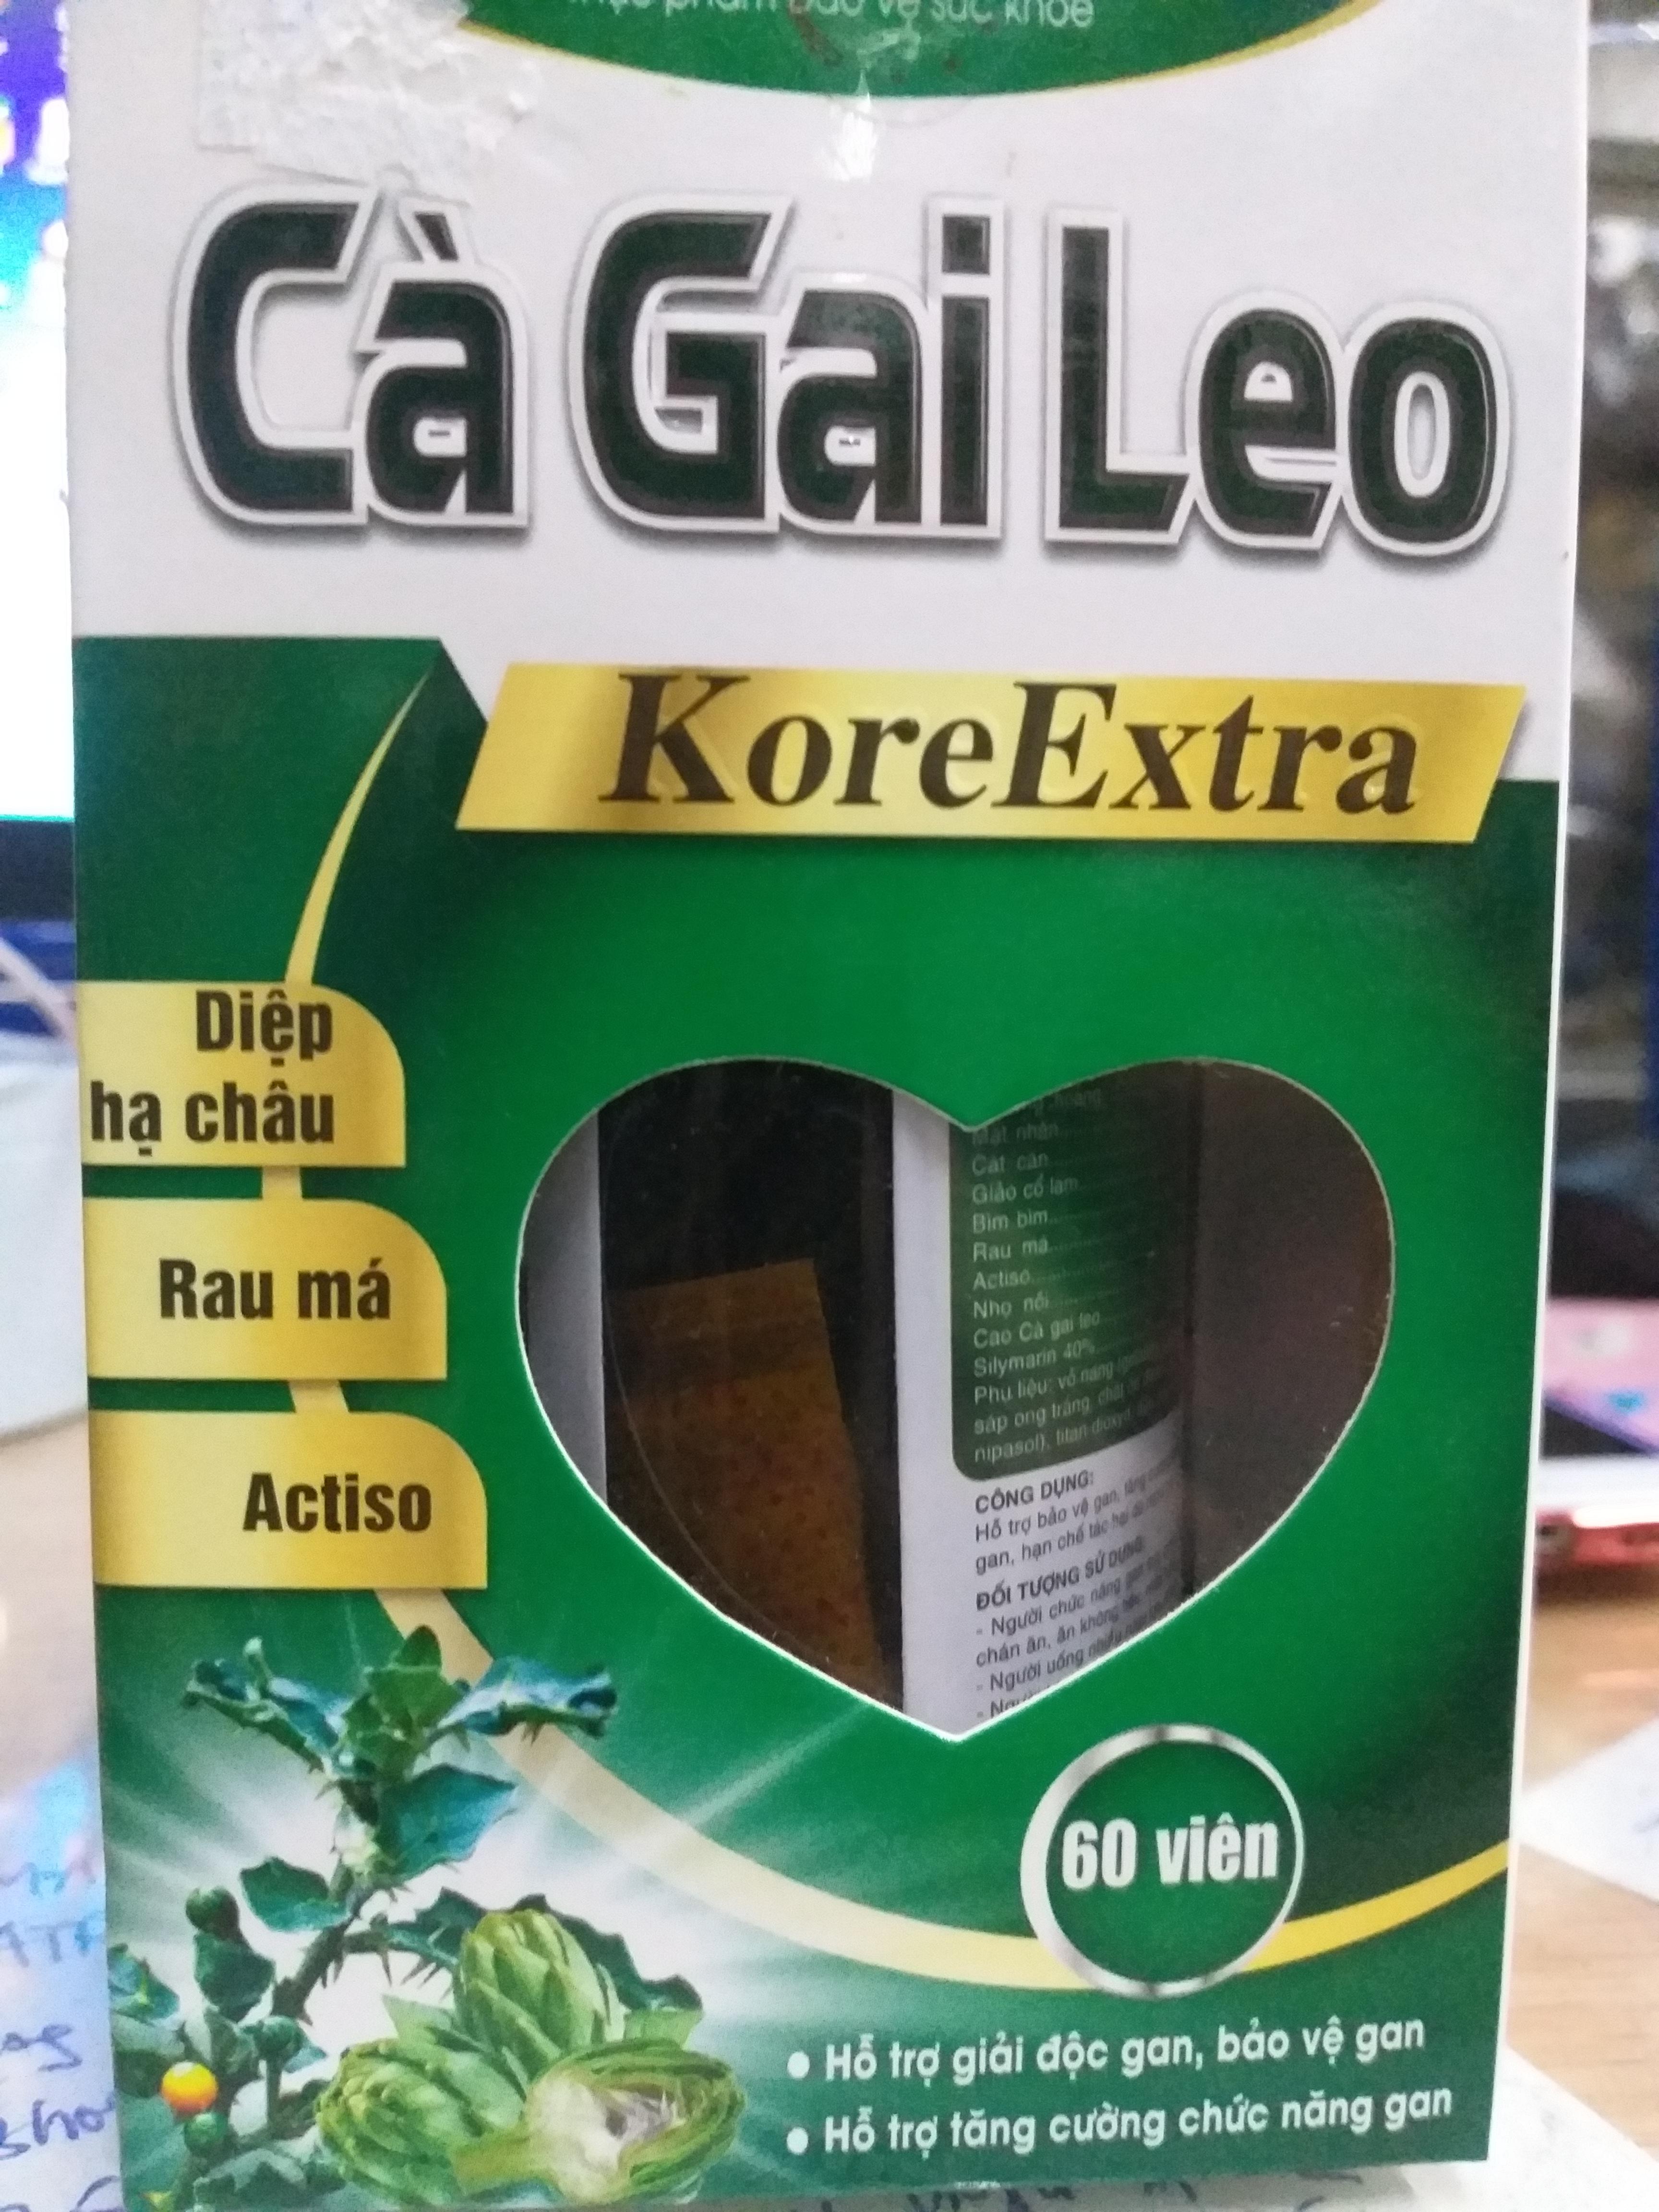 Cà gai leo Kore extra lọ 60 viên